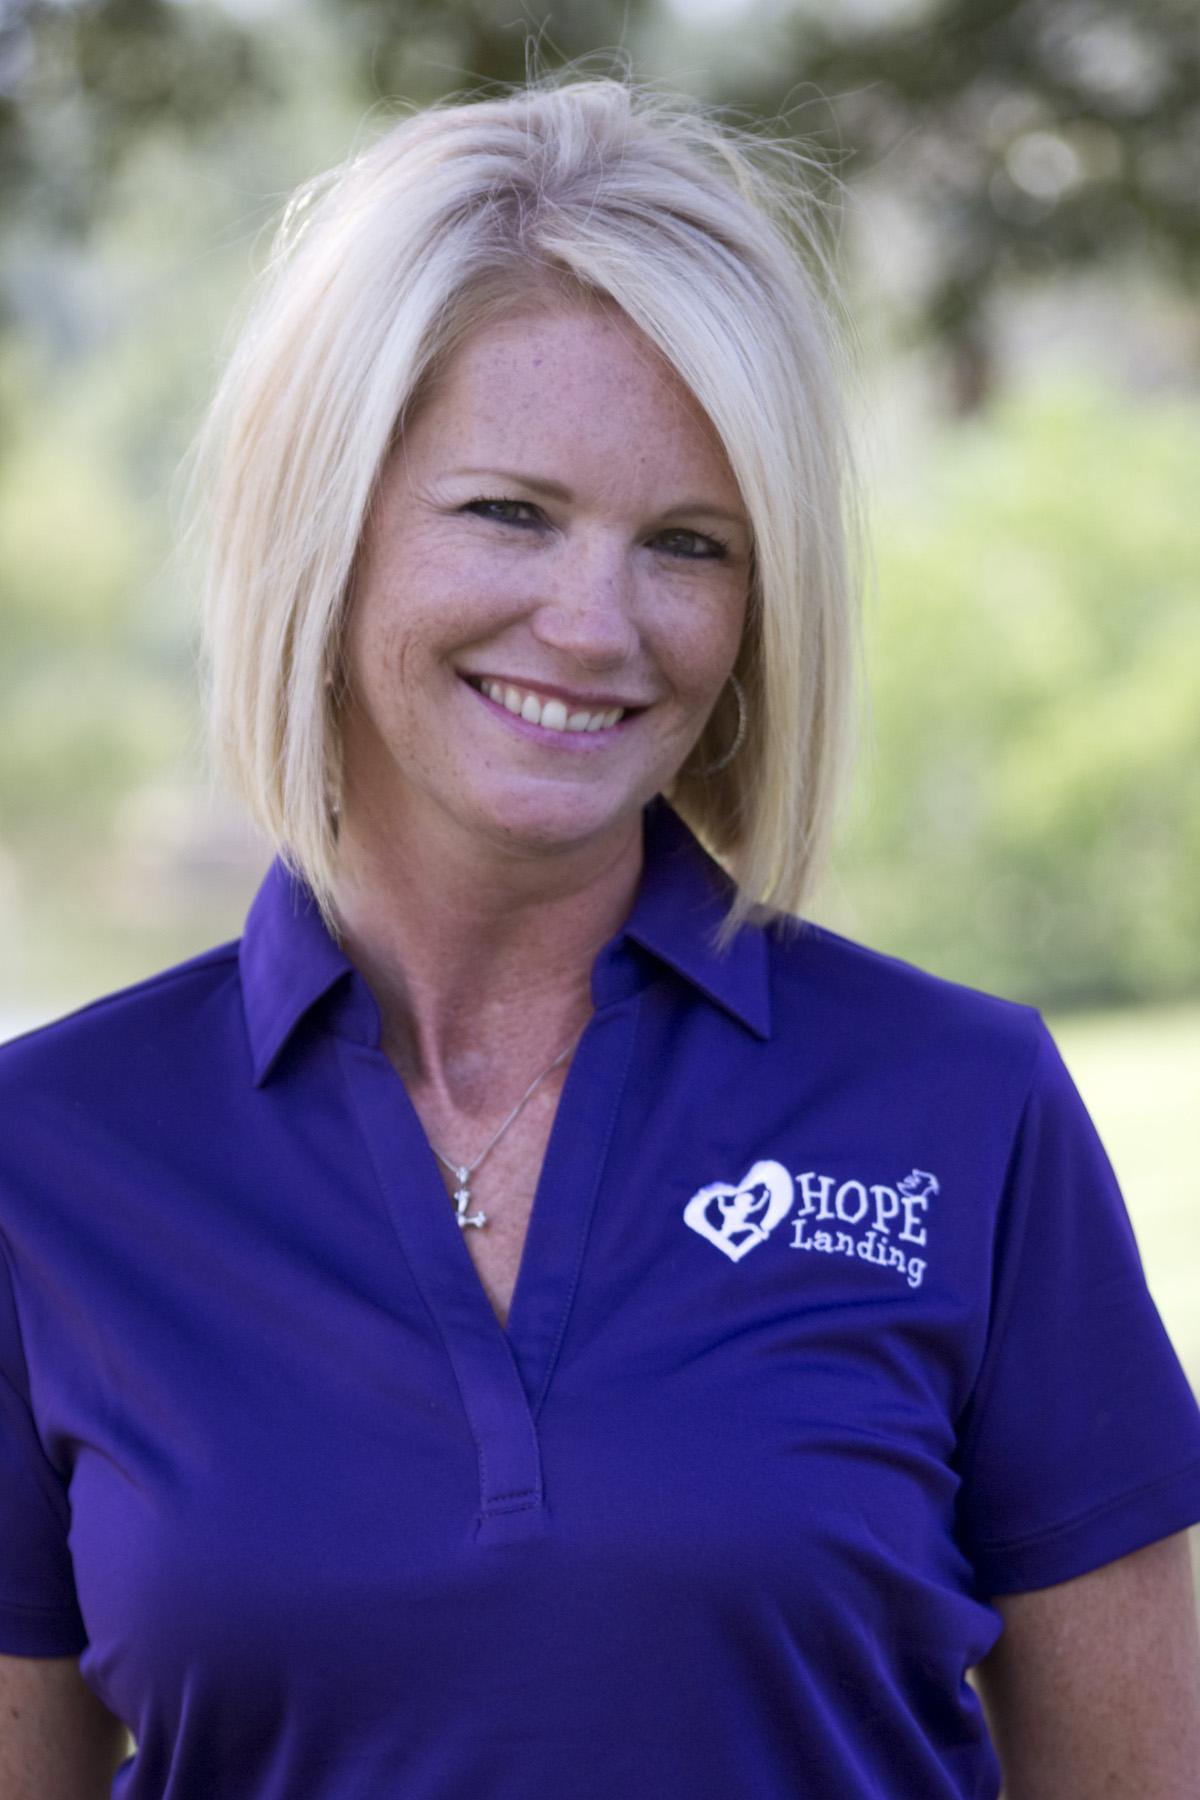 Kristi Lowery, President & CEO